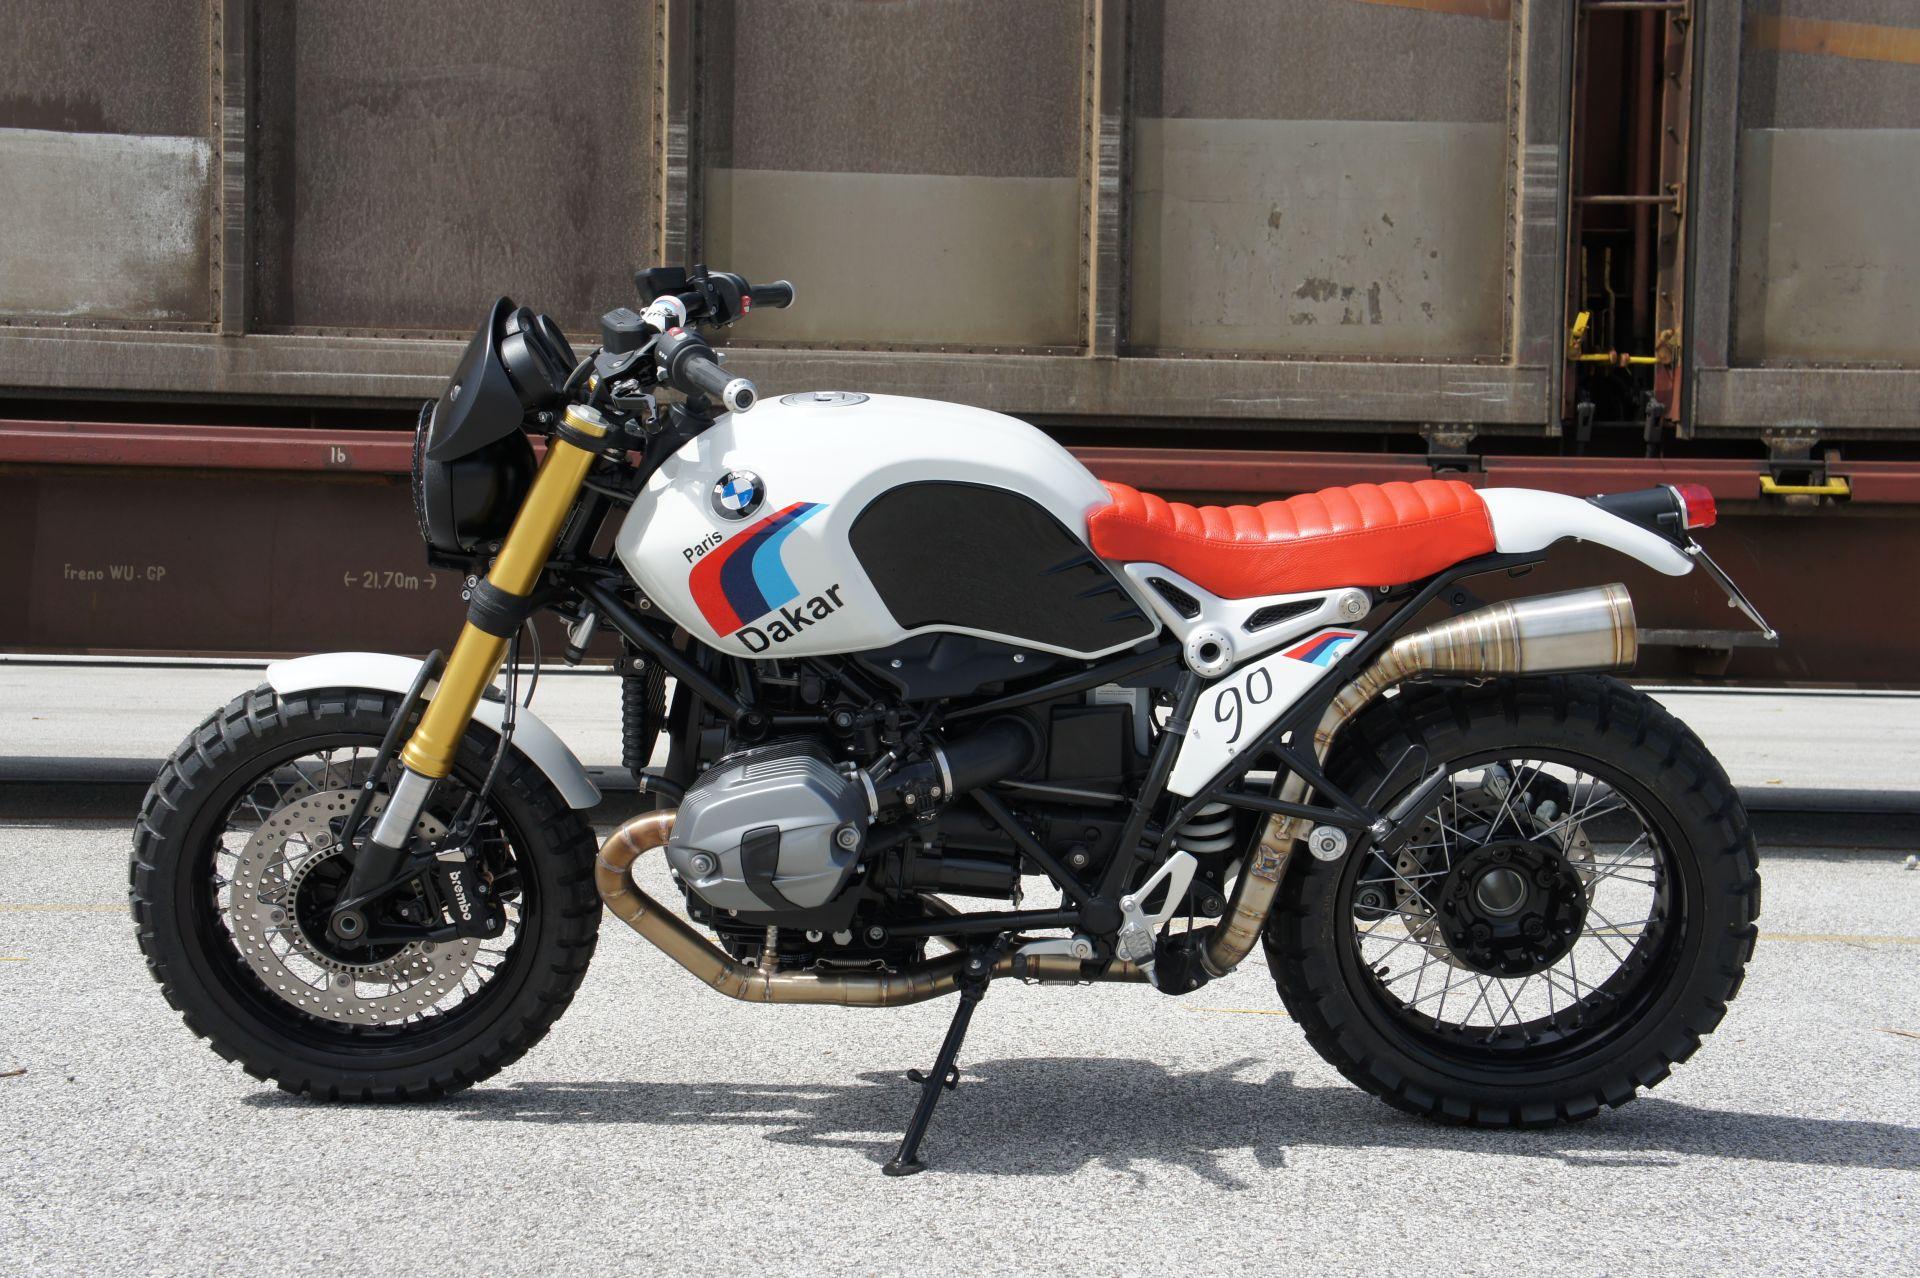 Build a Breathtaking Paris-Dakar BMW R nineT with the Luismoto Kit - autoevolution